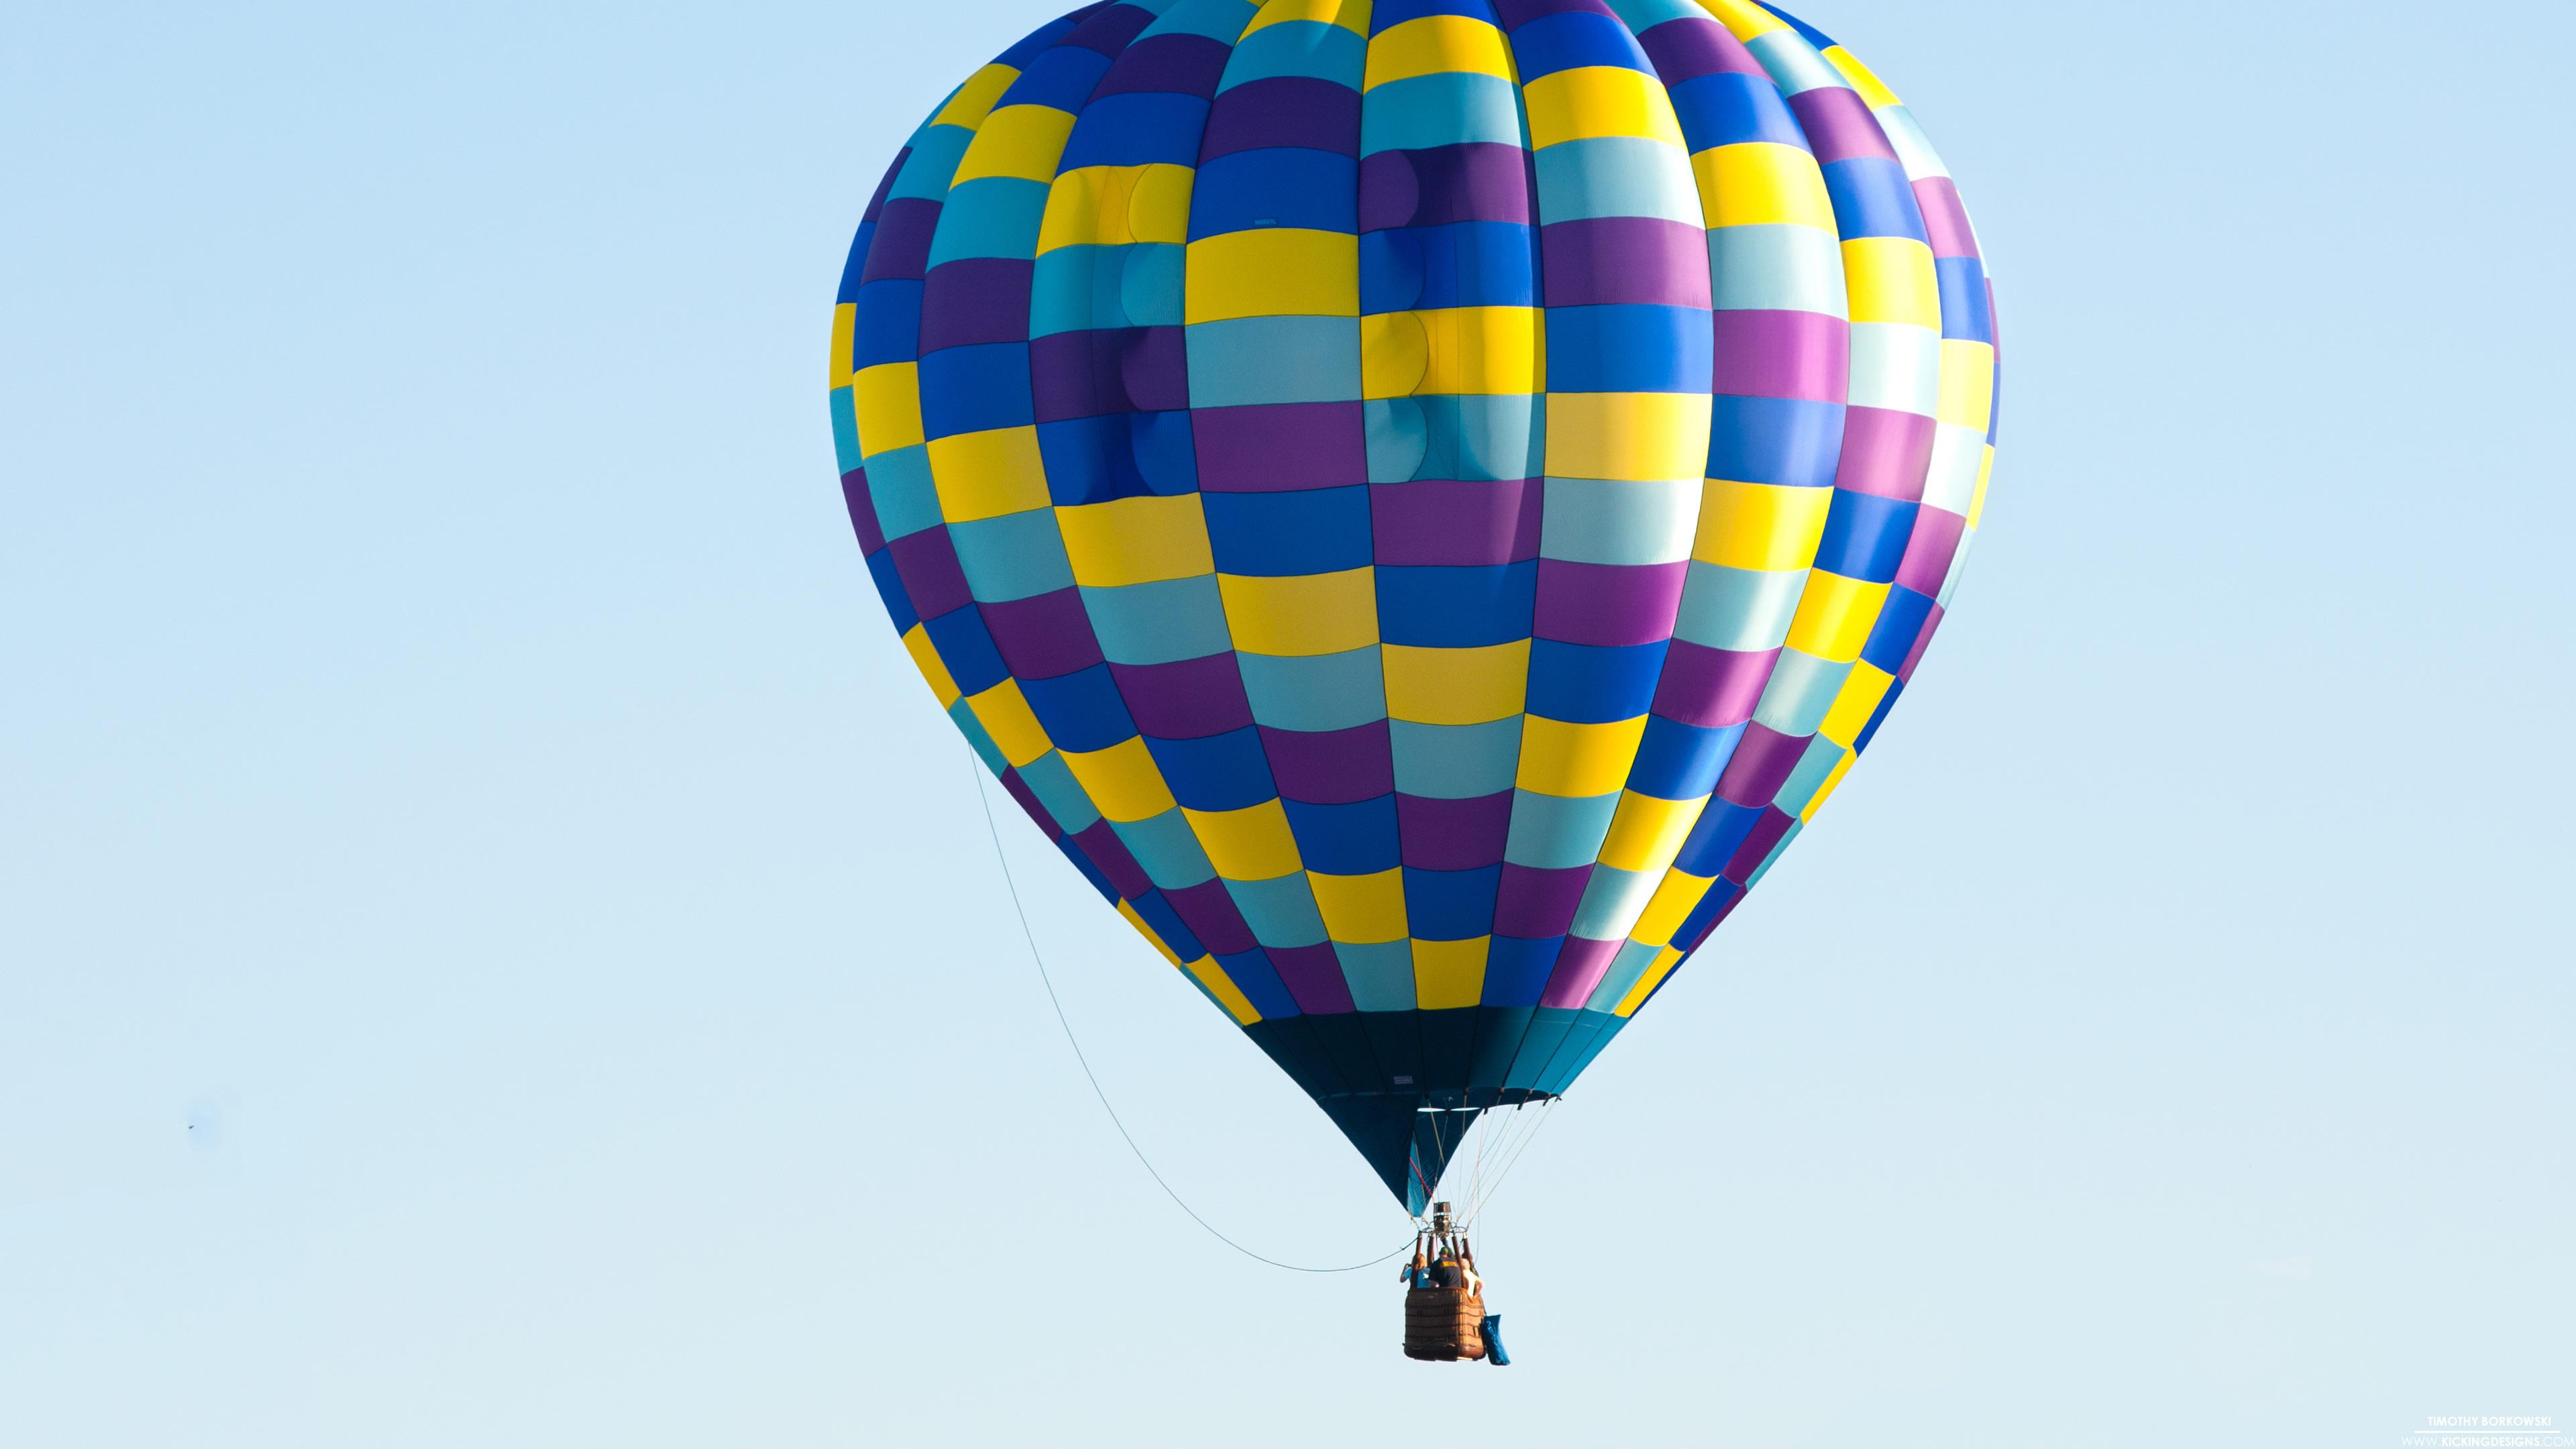 Hot Air Balloon 9 29 2013 Wallpaper Background Kicking Designs 3840x2160